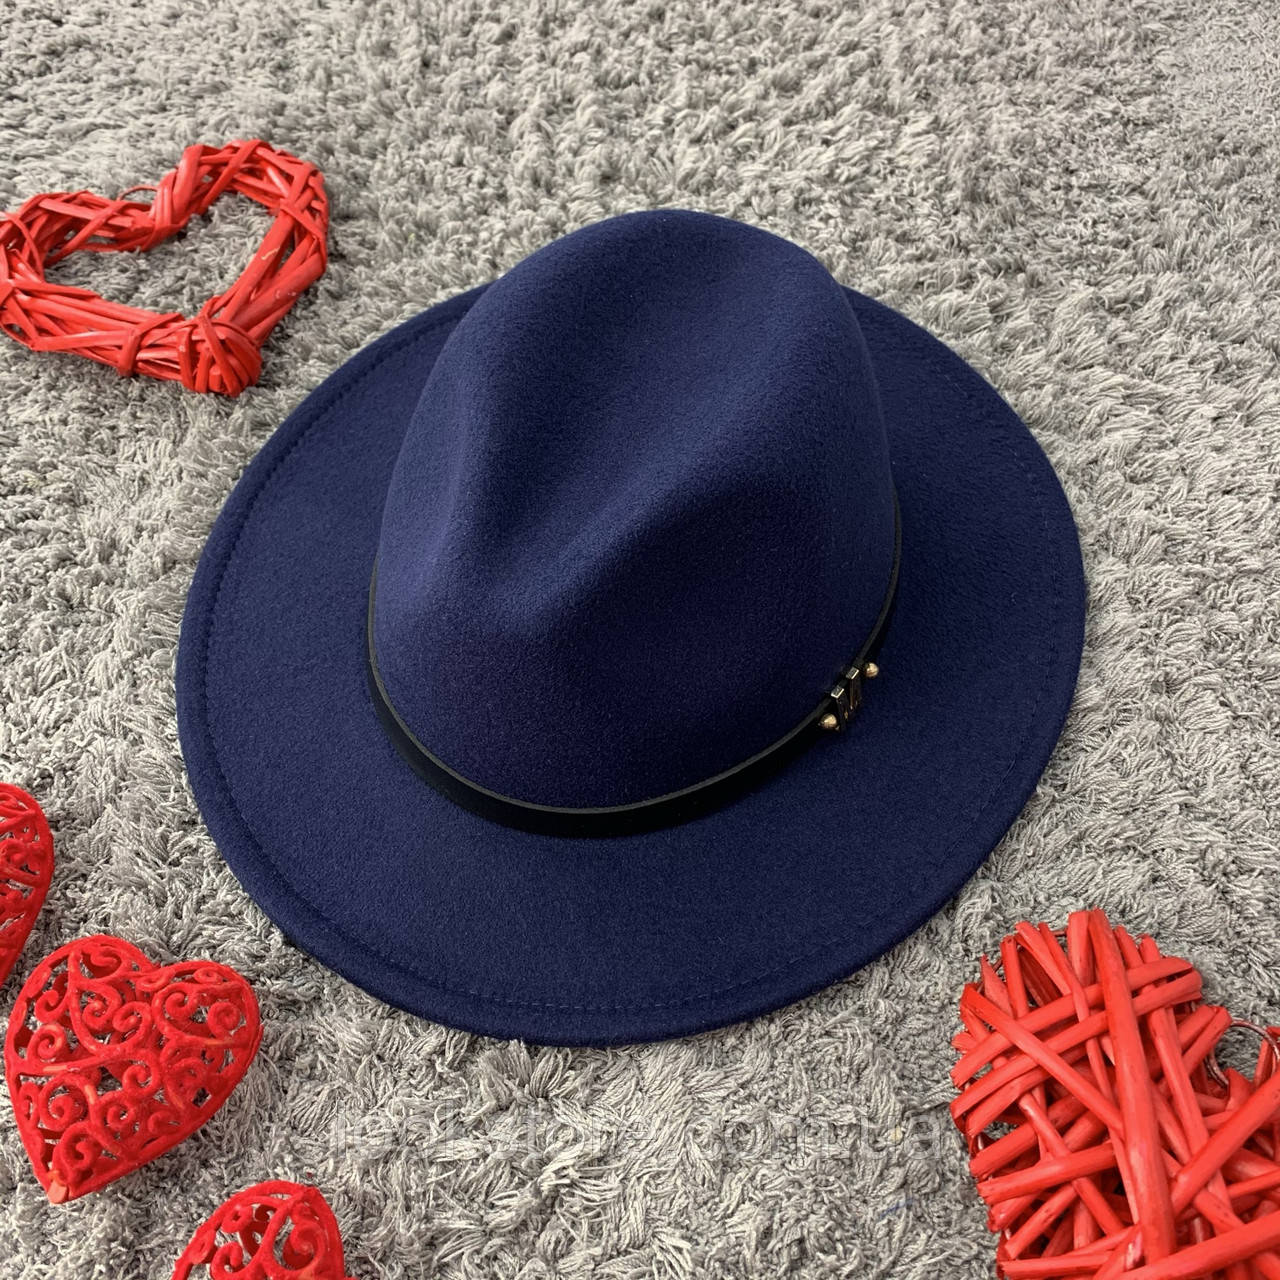 Шляпа Федора унисекс с устойчивыми полями ММ темно синяя